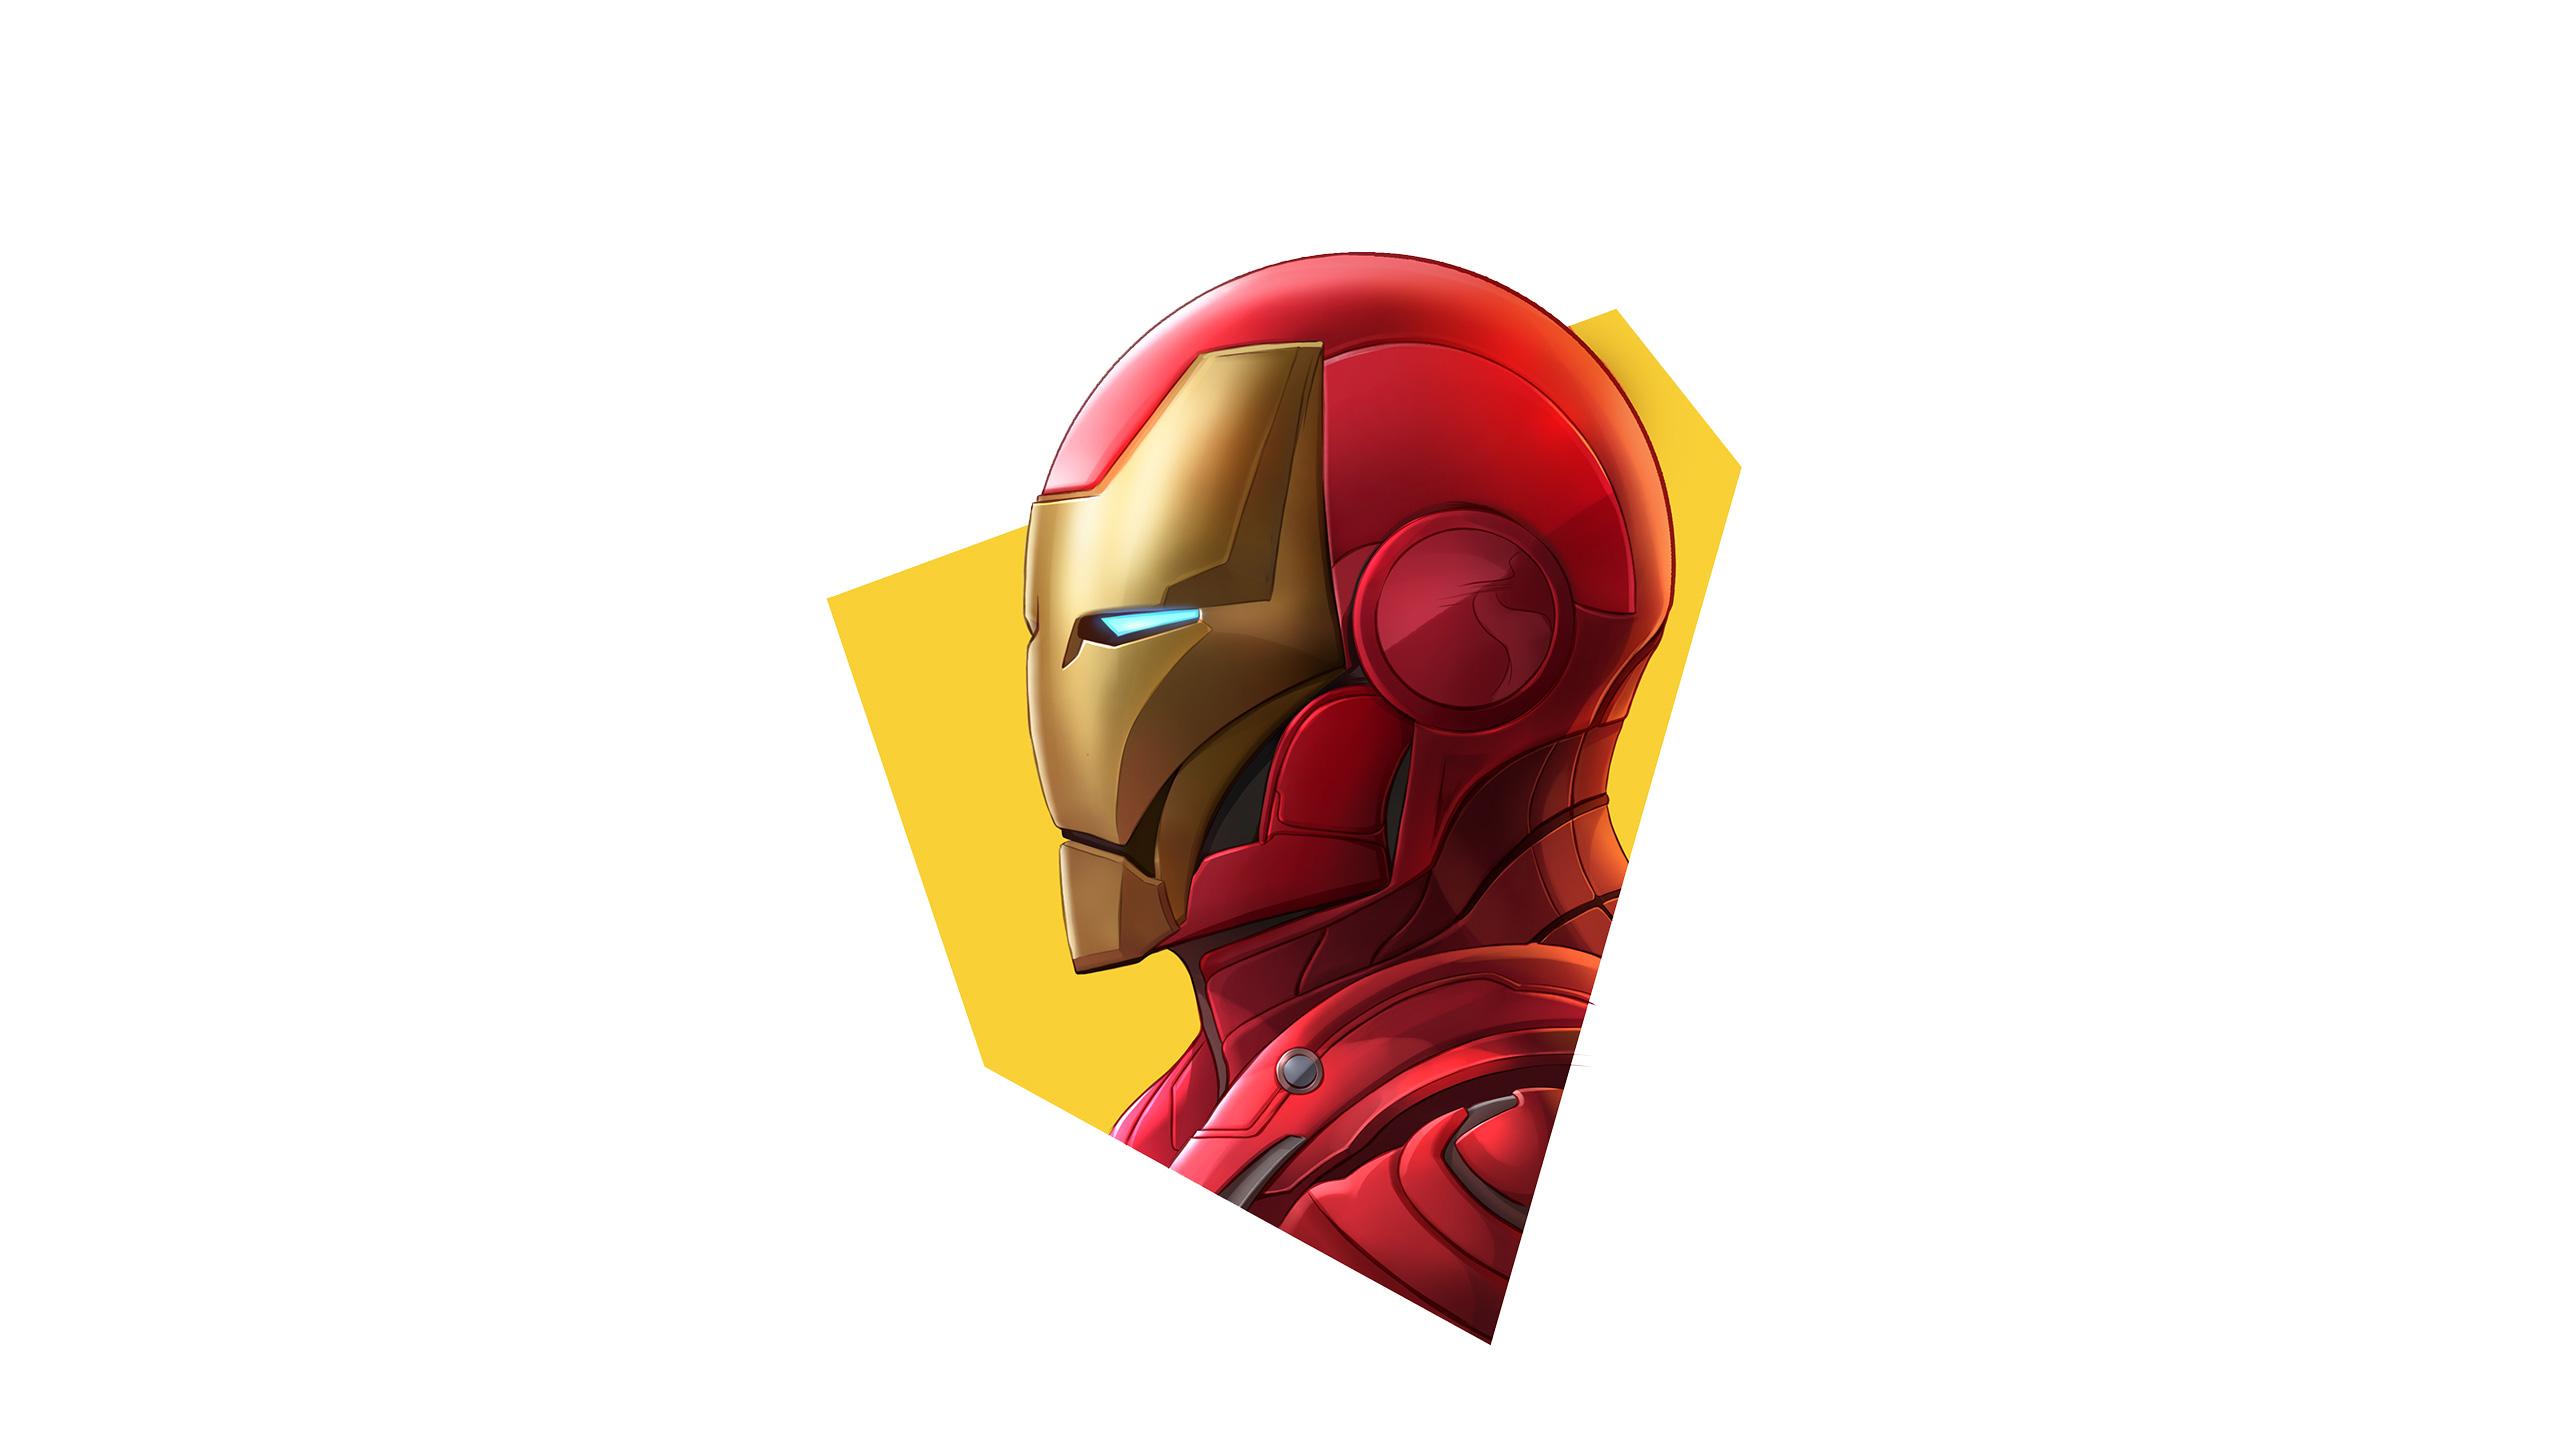 Iron Man Simple Minimalism, HD Superheroes, 4k Wallpapers ...